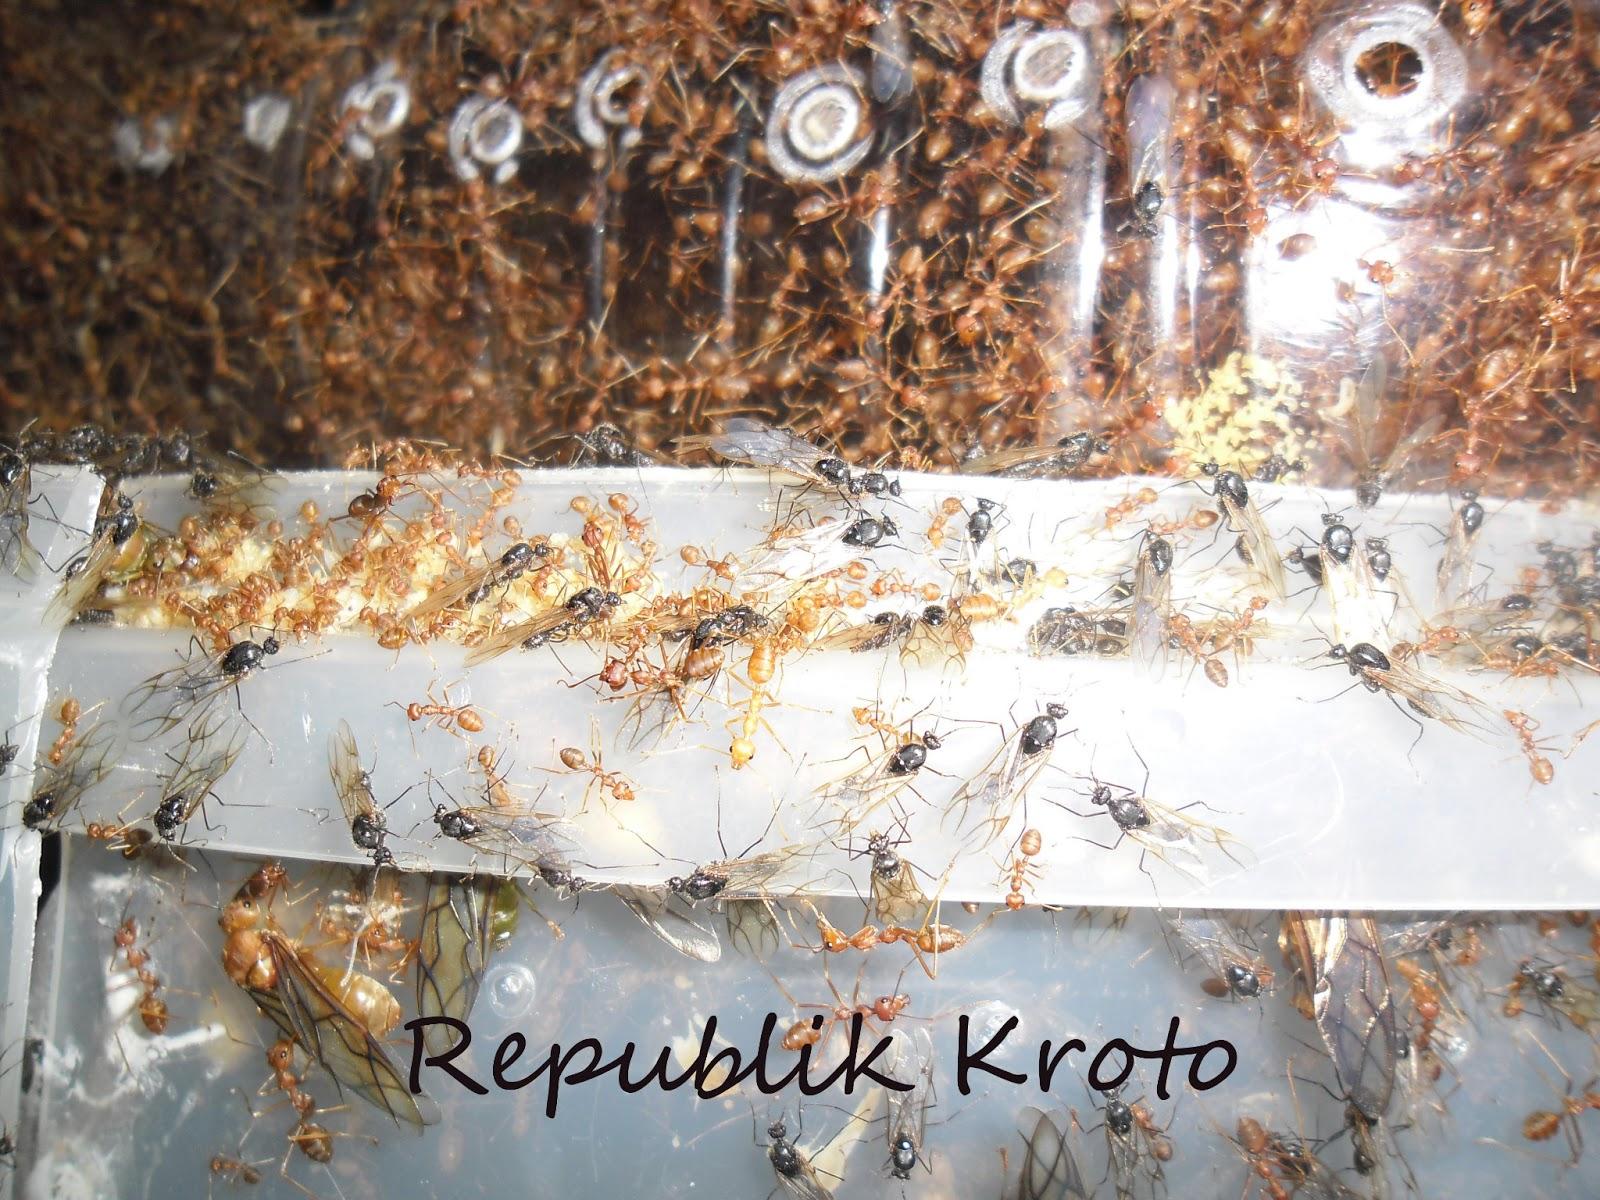 Republik Kroto Ternak Kroto Budidaya Semut Rangrang Di Toples